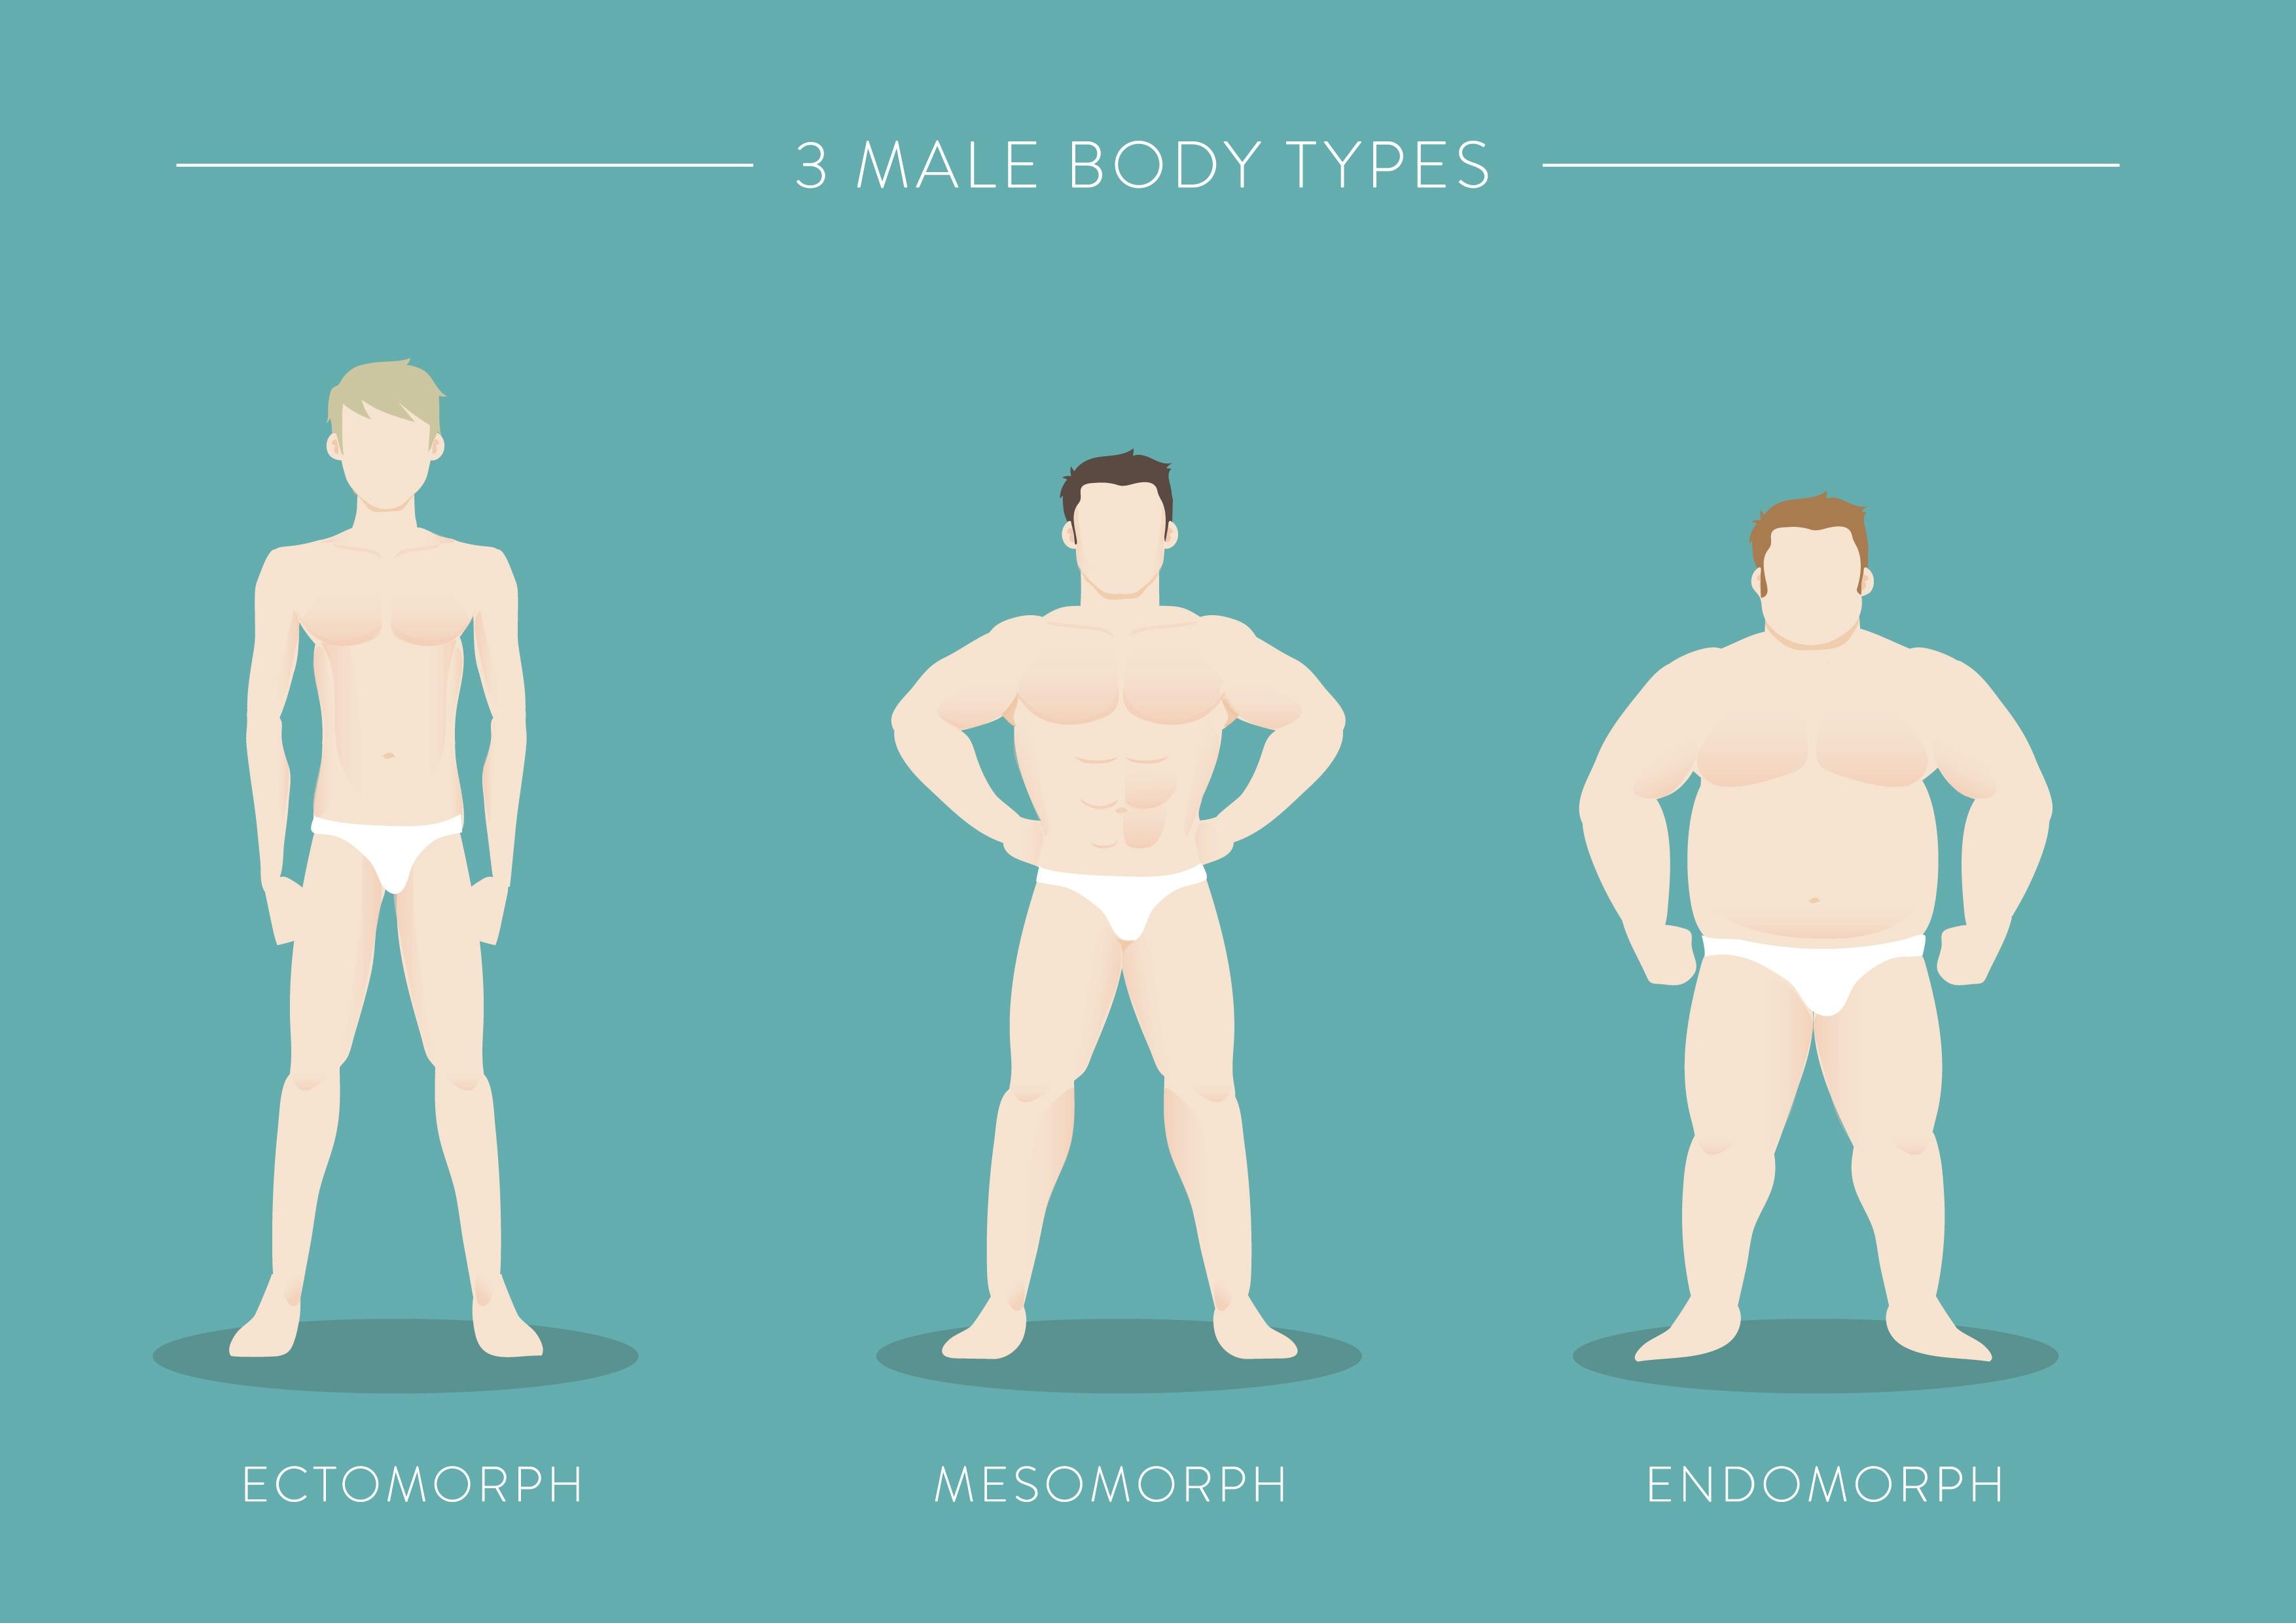 male body types ectomorph mesomorph endomorph